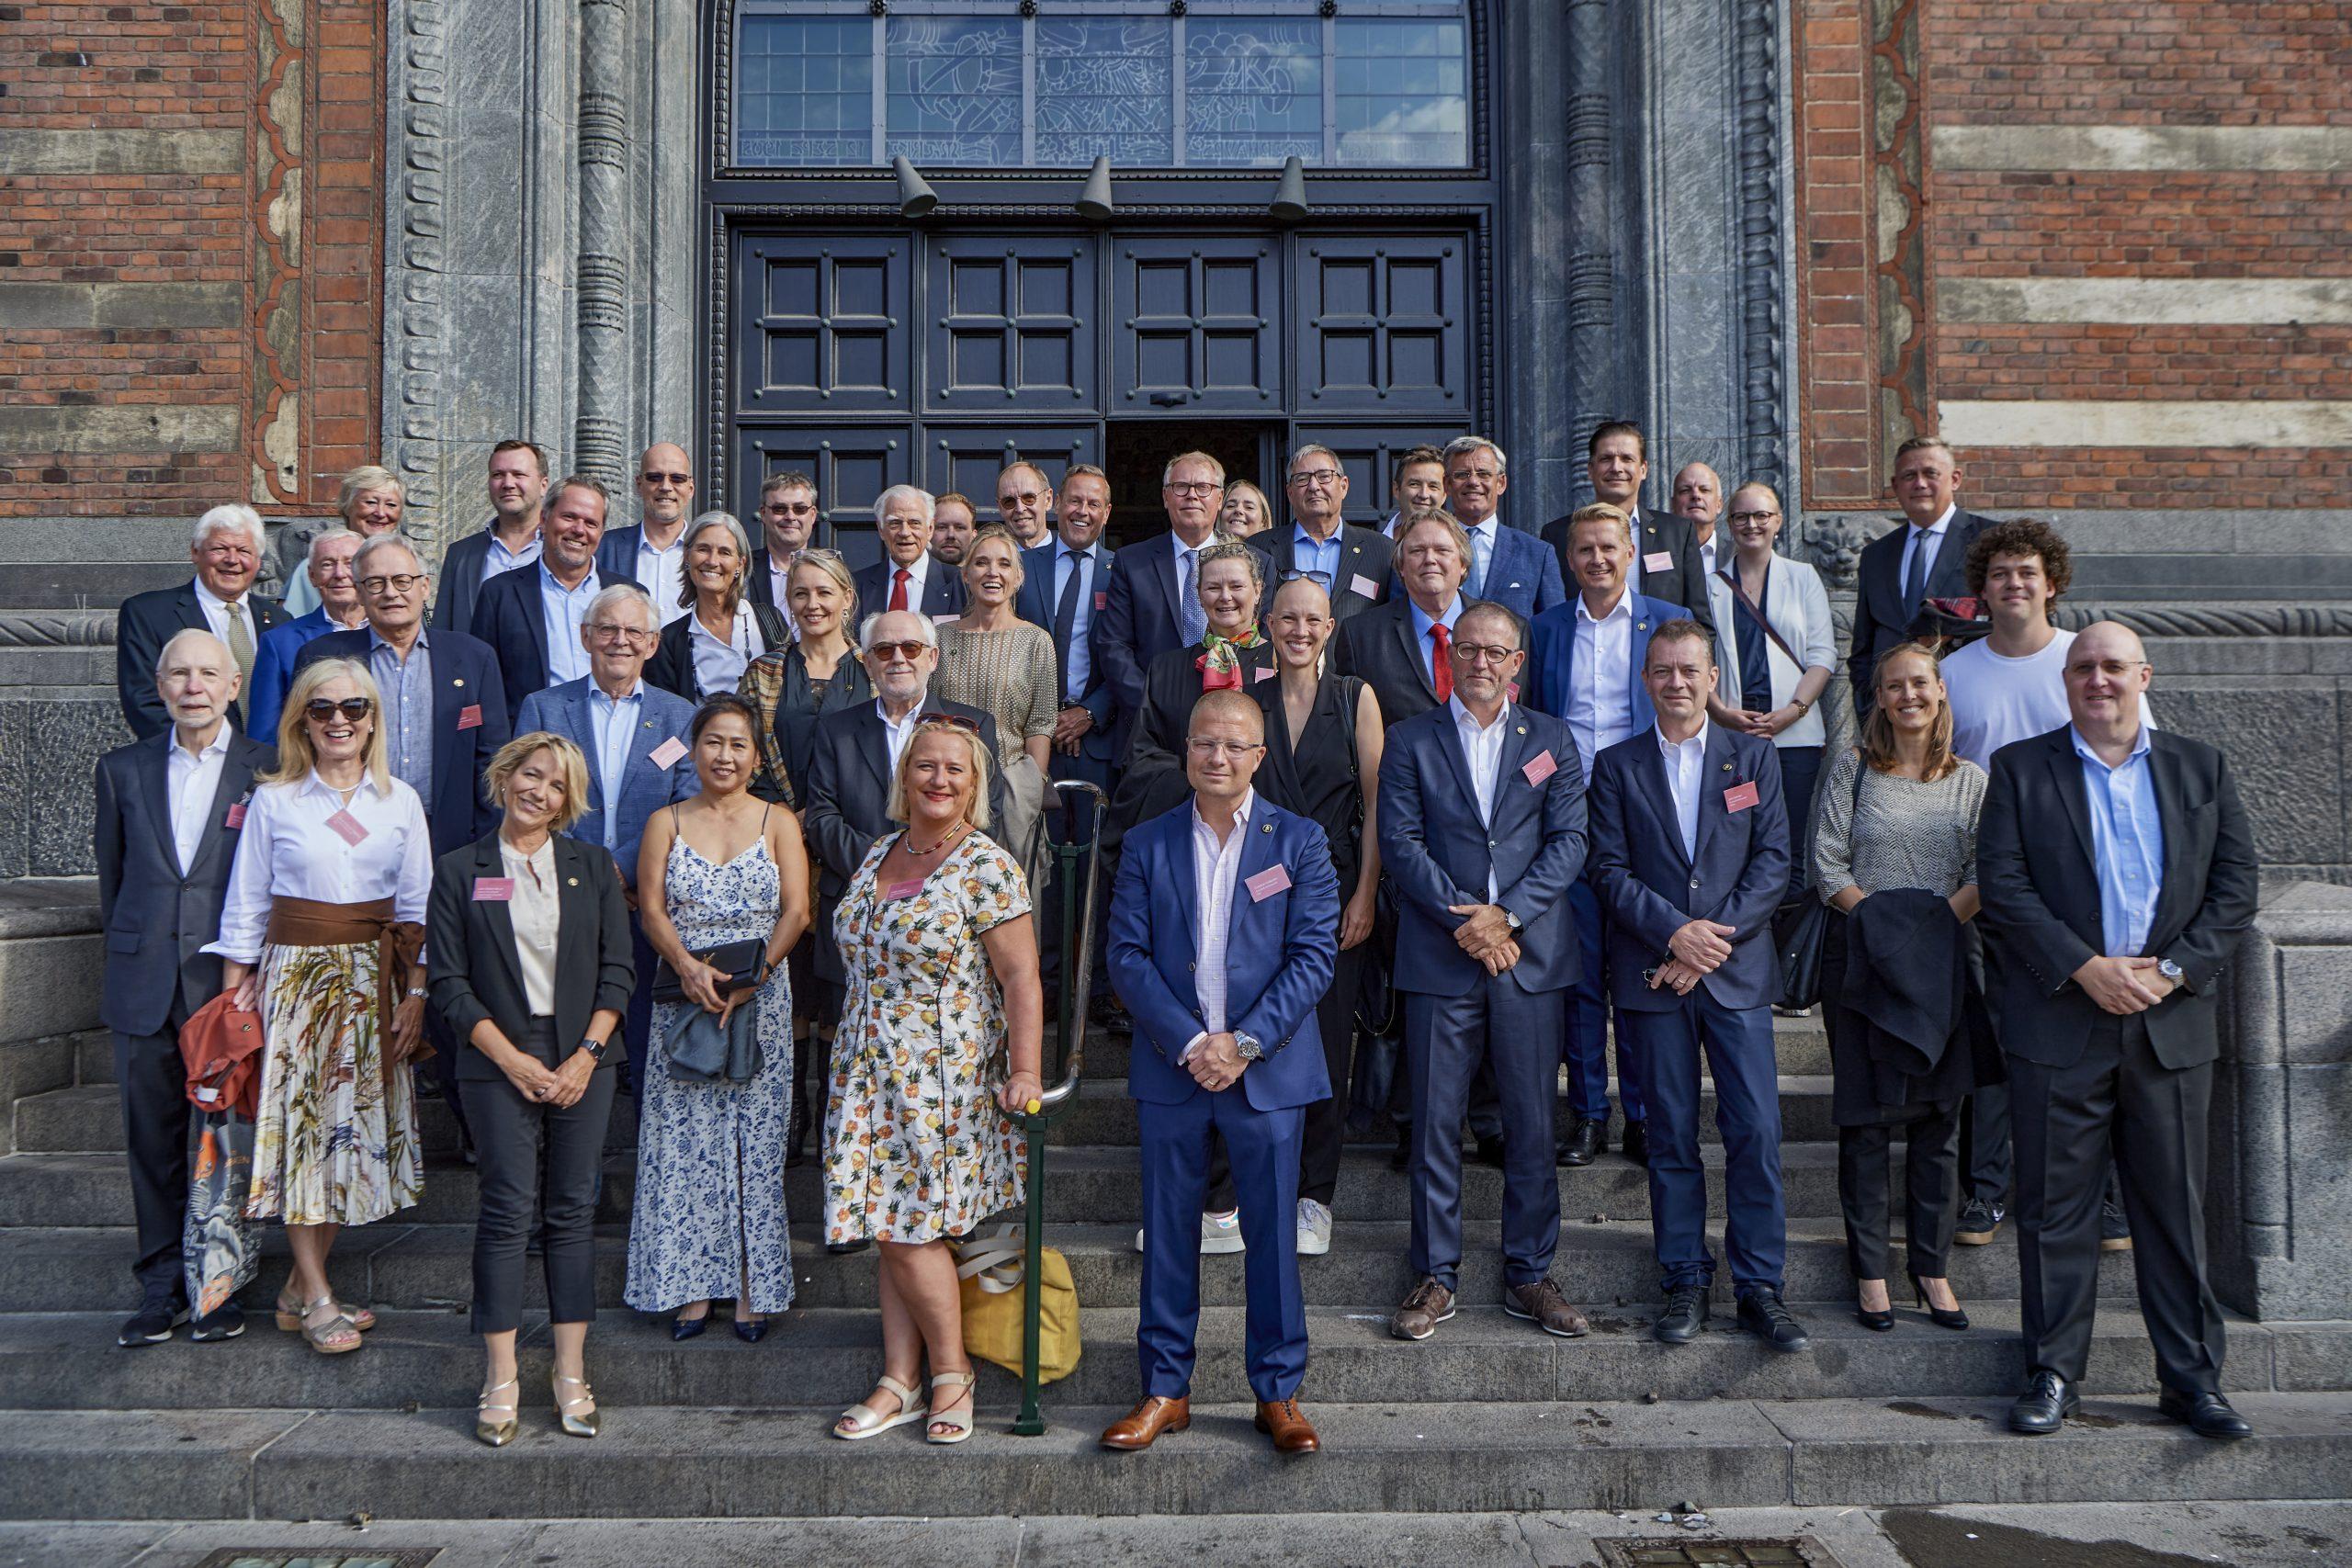 Wonderful Copenhagen og Copenhagen Capacity har atter samlet Københavns goodwill-ambassadører. Her fra besøg på Københavns Rådhus. Foto: Carsten Lundager for Wonderful Copenhagen.